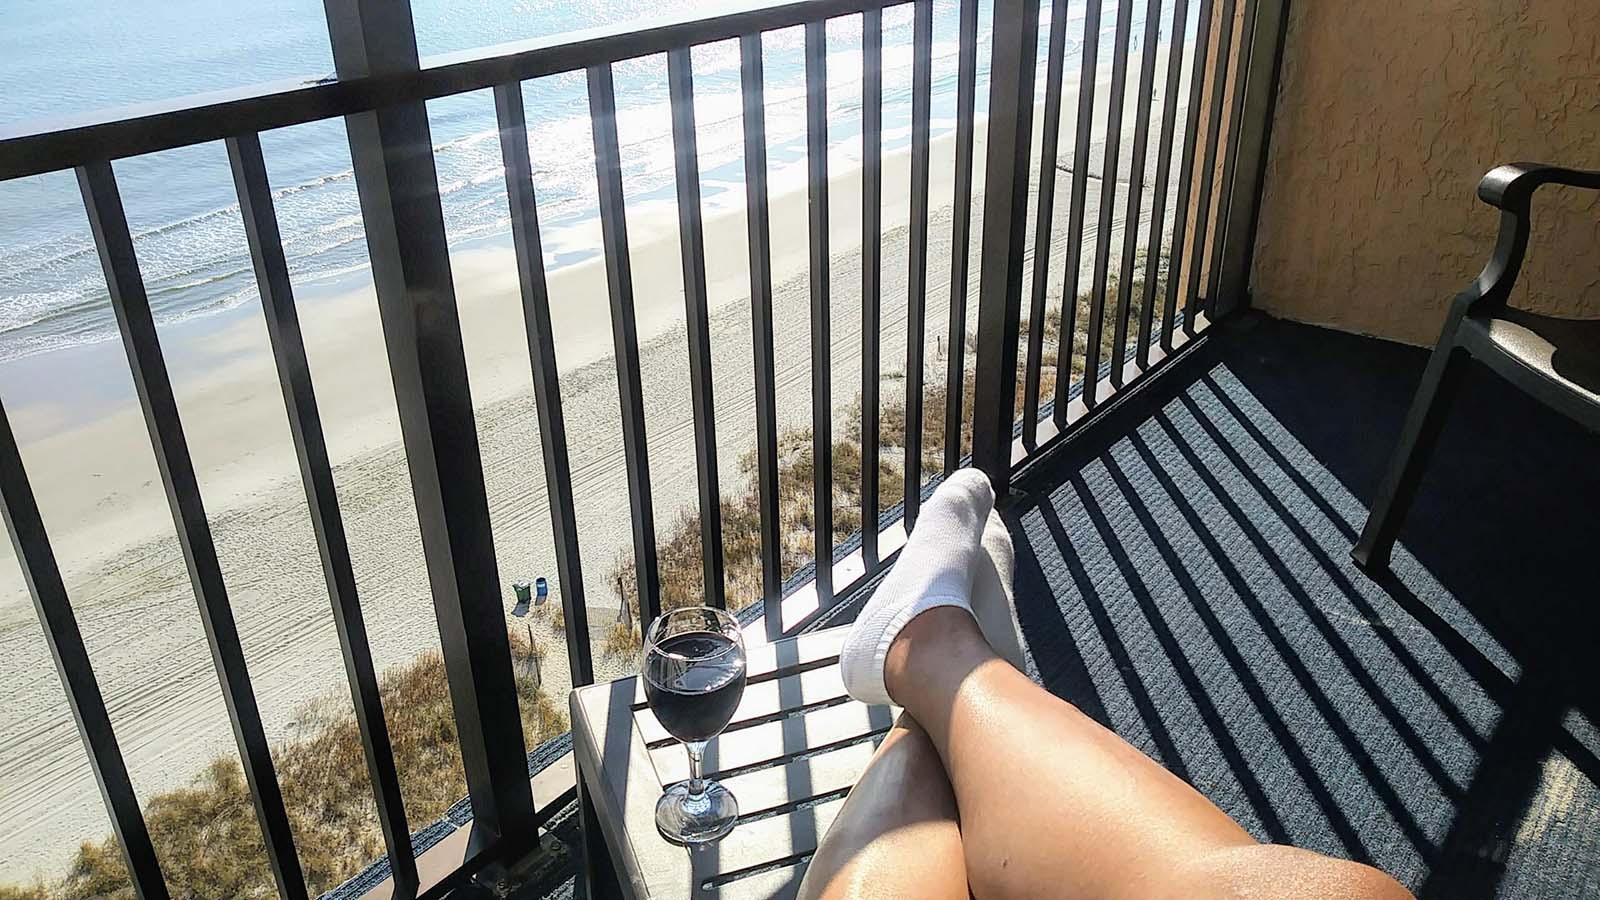 women drinking wine on balcony facing the ocean